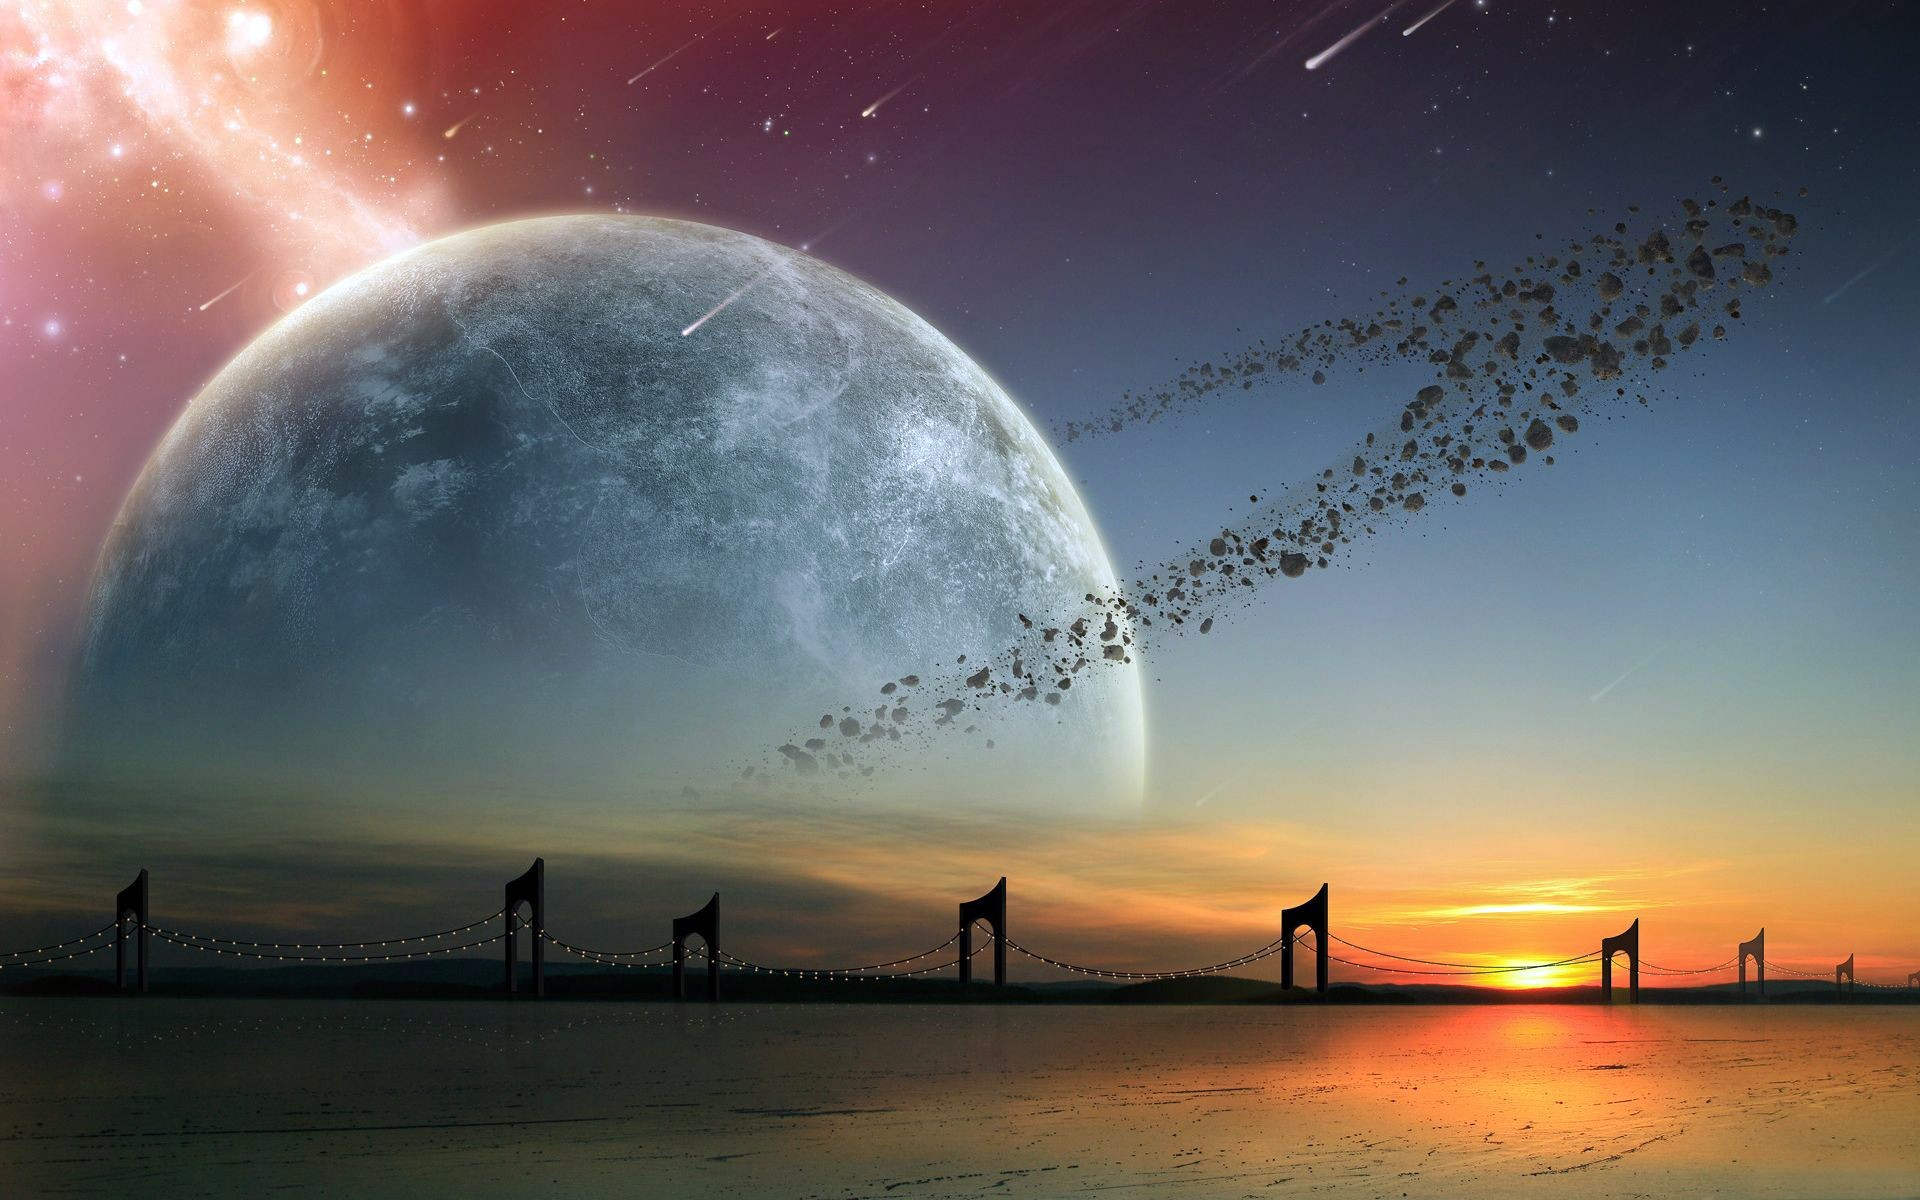 Alien Planet Landscapes Wallpaper - WallpaperSafari